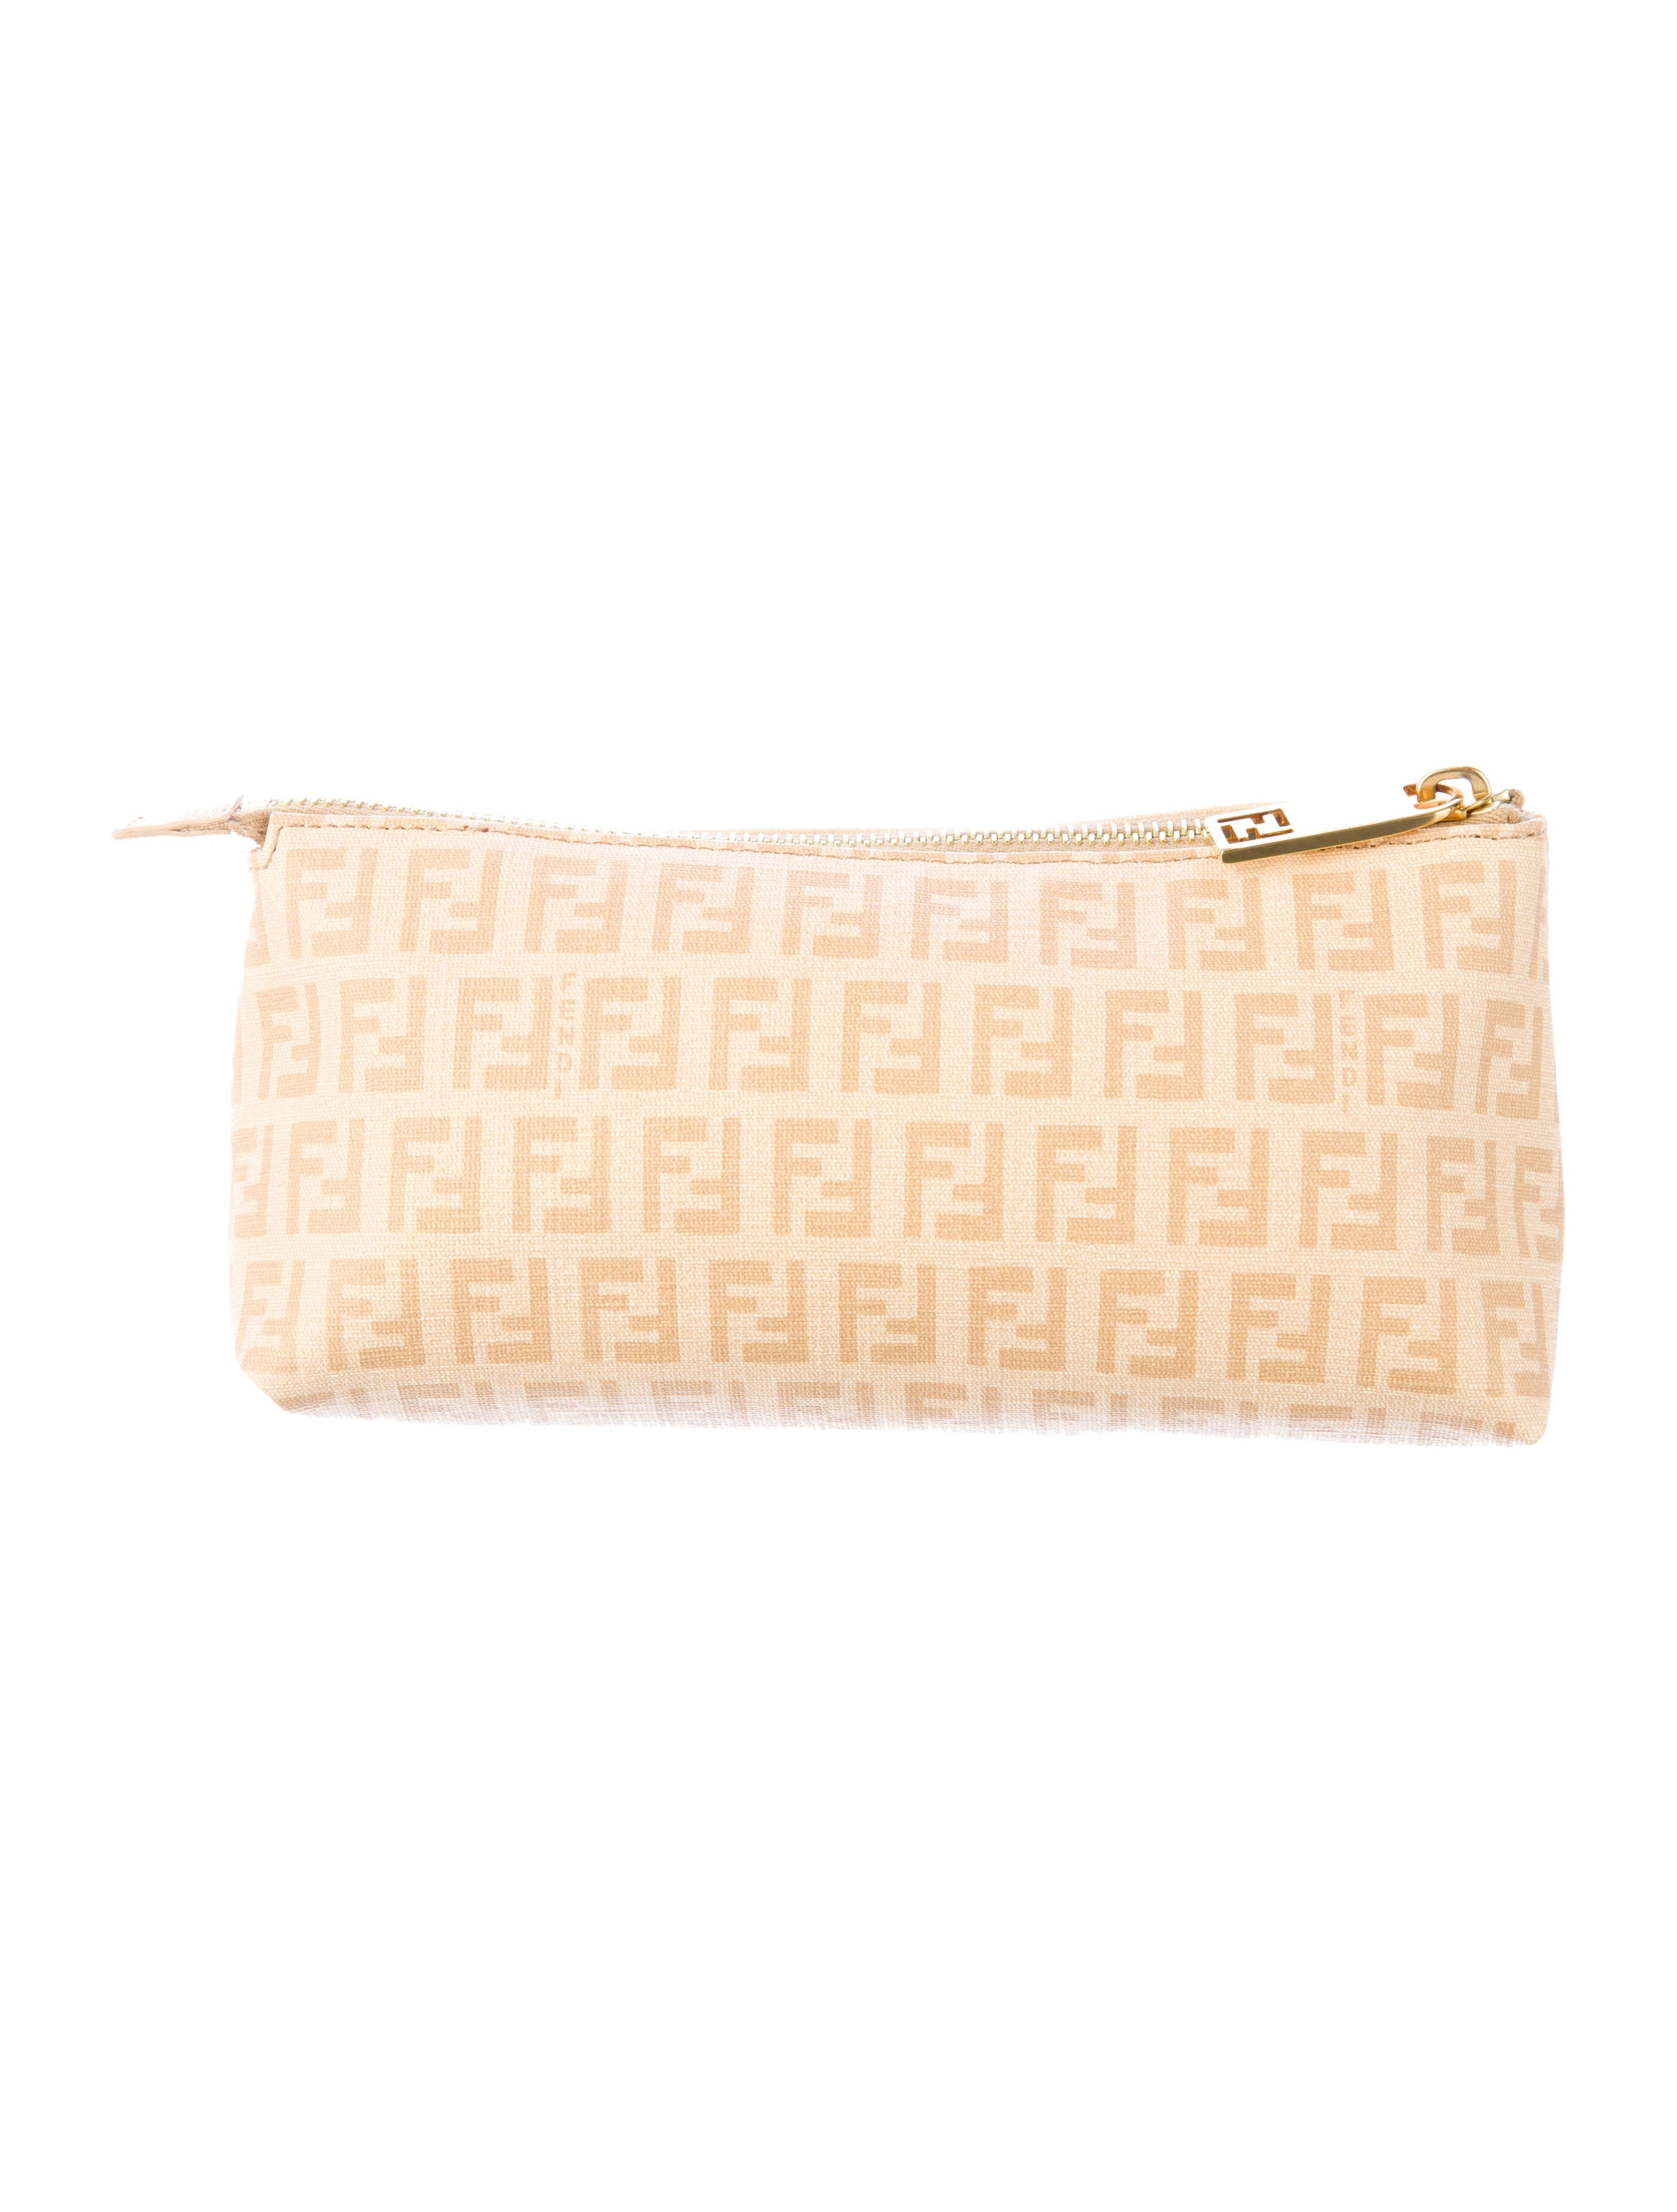 Fendi Zucchino Cosmetic Pouch - Accessories - FEN26166  9a276768b4d6a